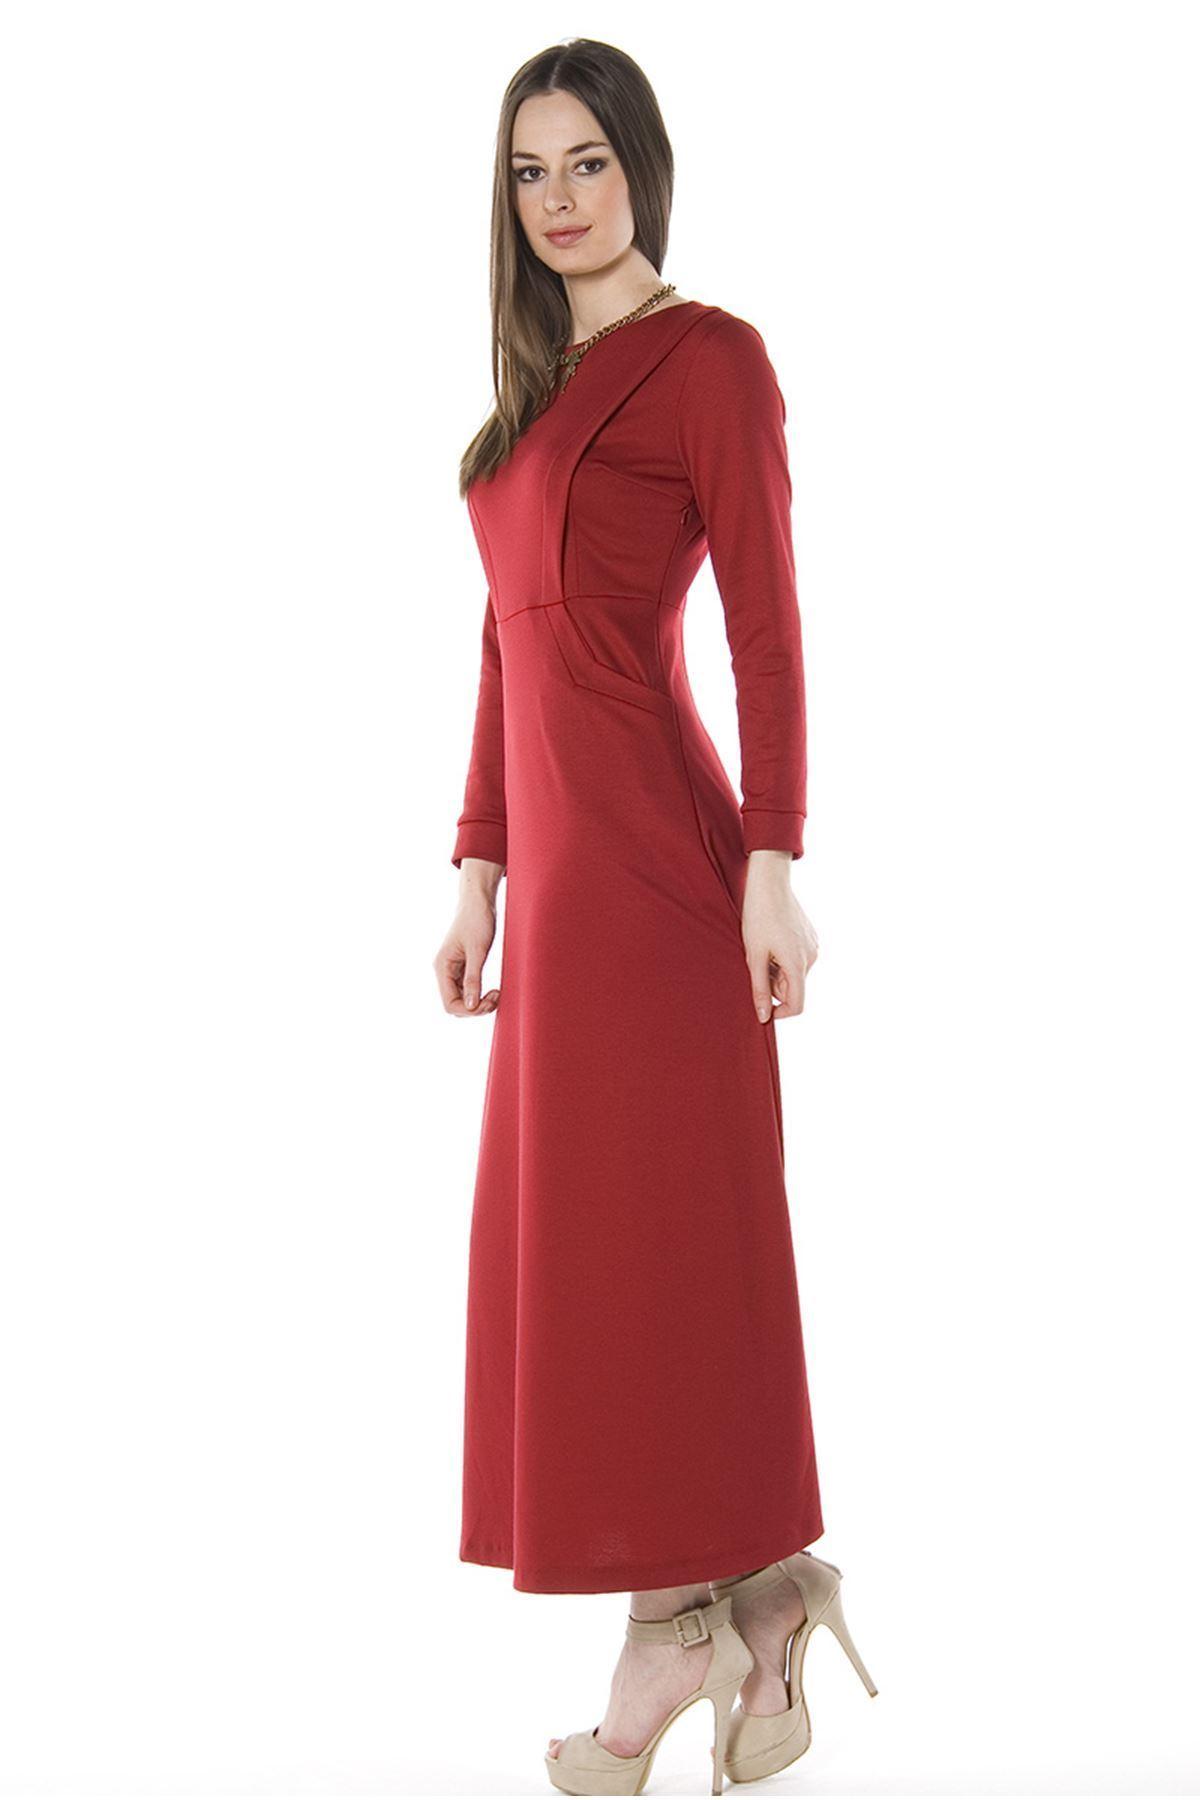 Bordo Uzun Elbise H8-67926